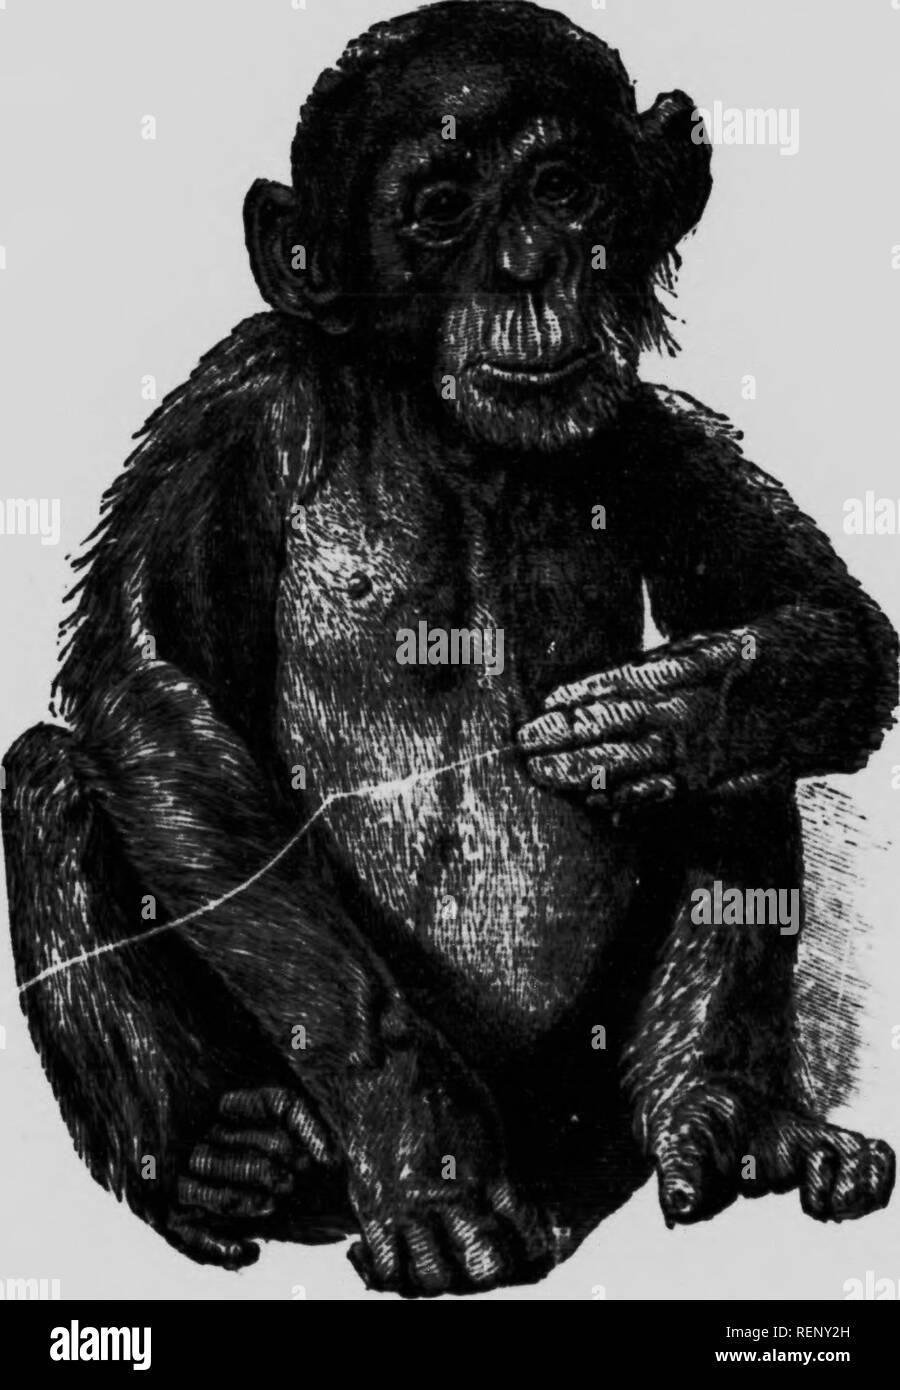 Chimpanzee Attack Stock Photos & Chimpanzee Attack Stock